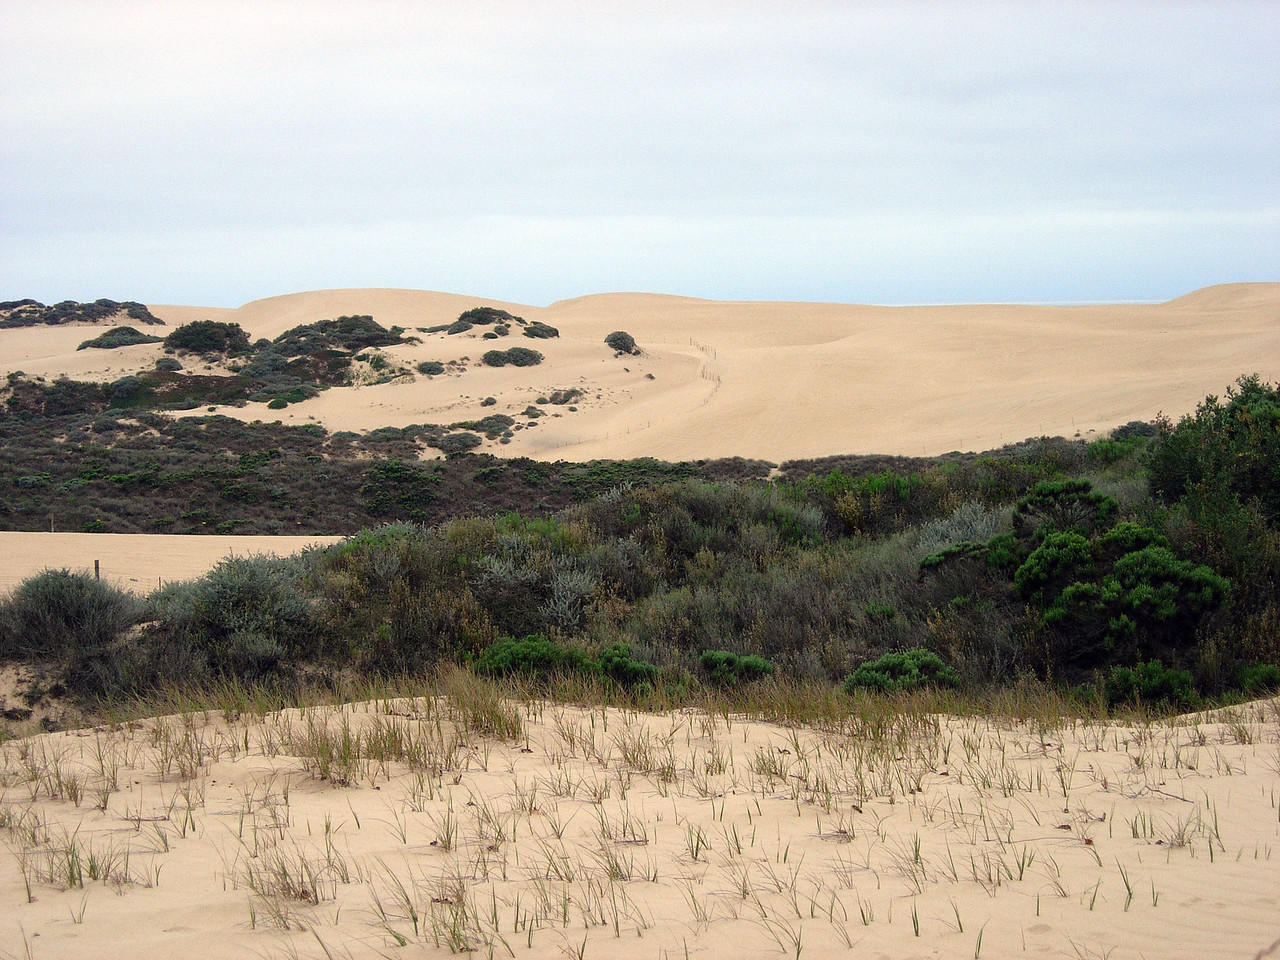 Sand dunes all around.